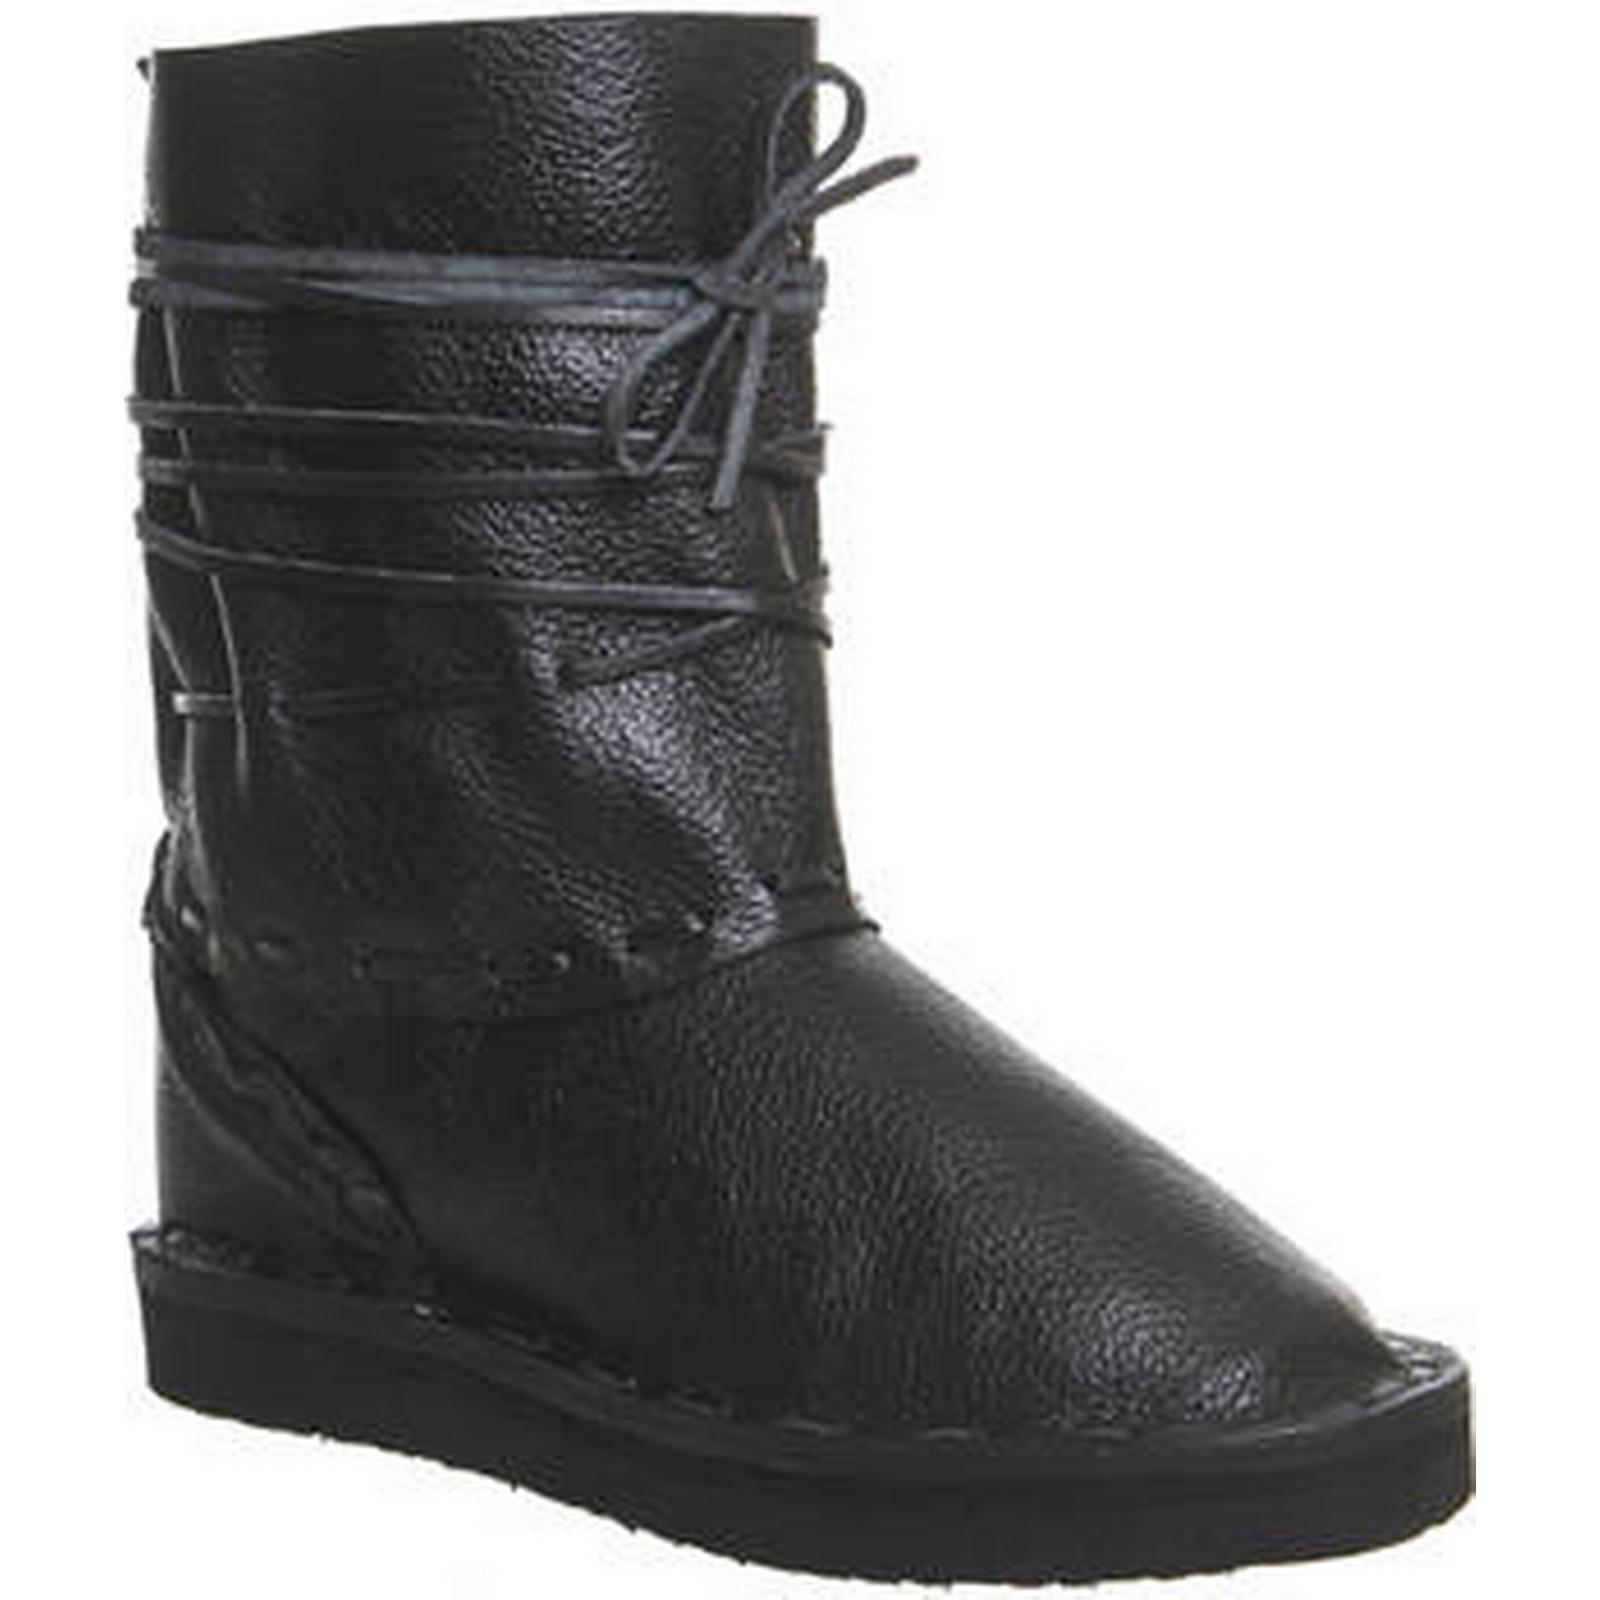 Chamula Vw Vw Vw Boot BLACK LEATHER 9e7a9d